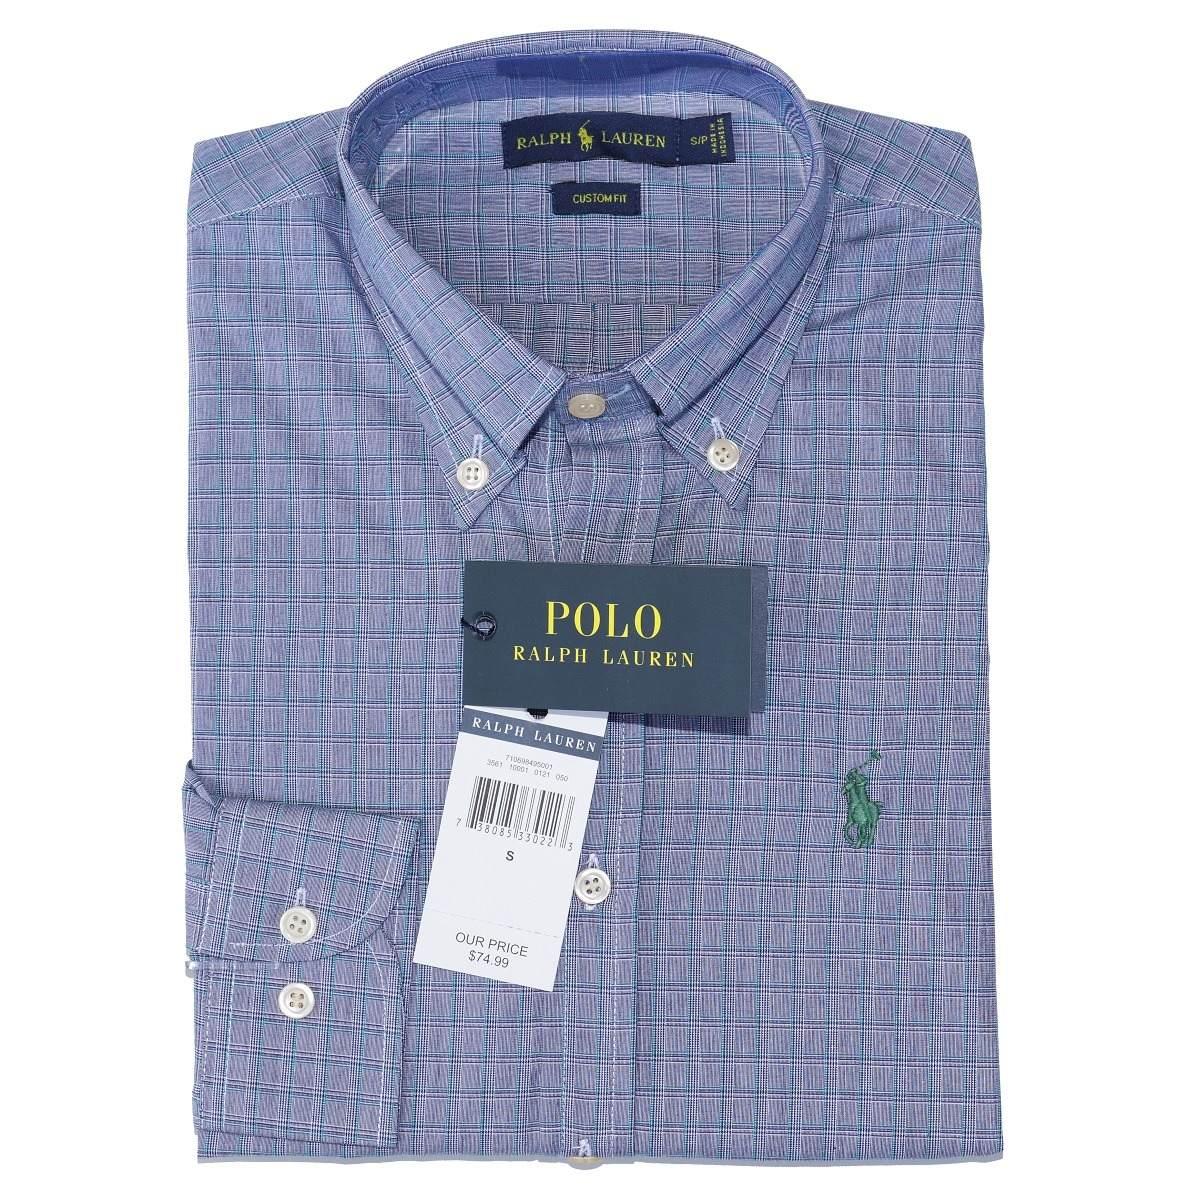 camisa social ralph lauren masc c fit cinza xadrez original. Carregando  zoom. 5cd1cd3f72b